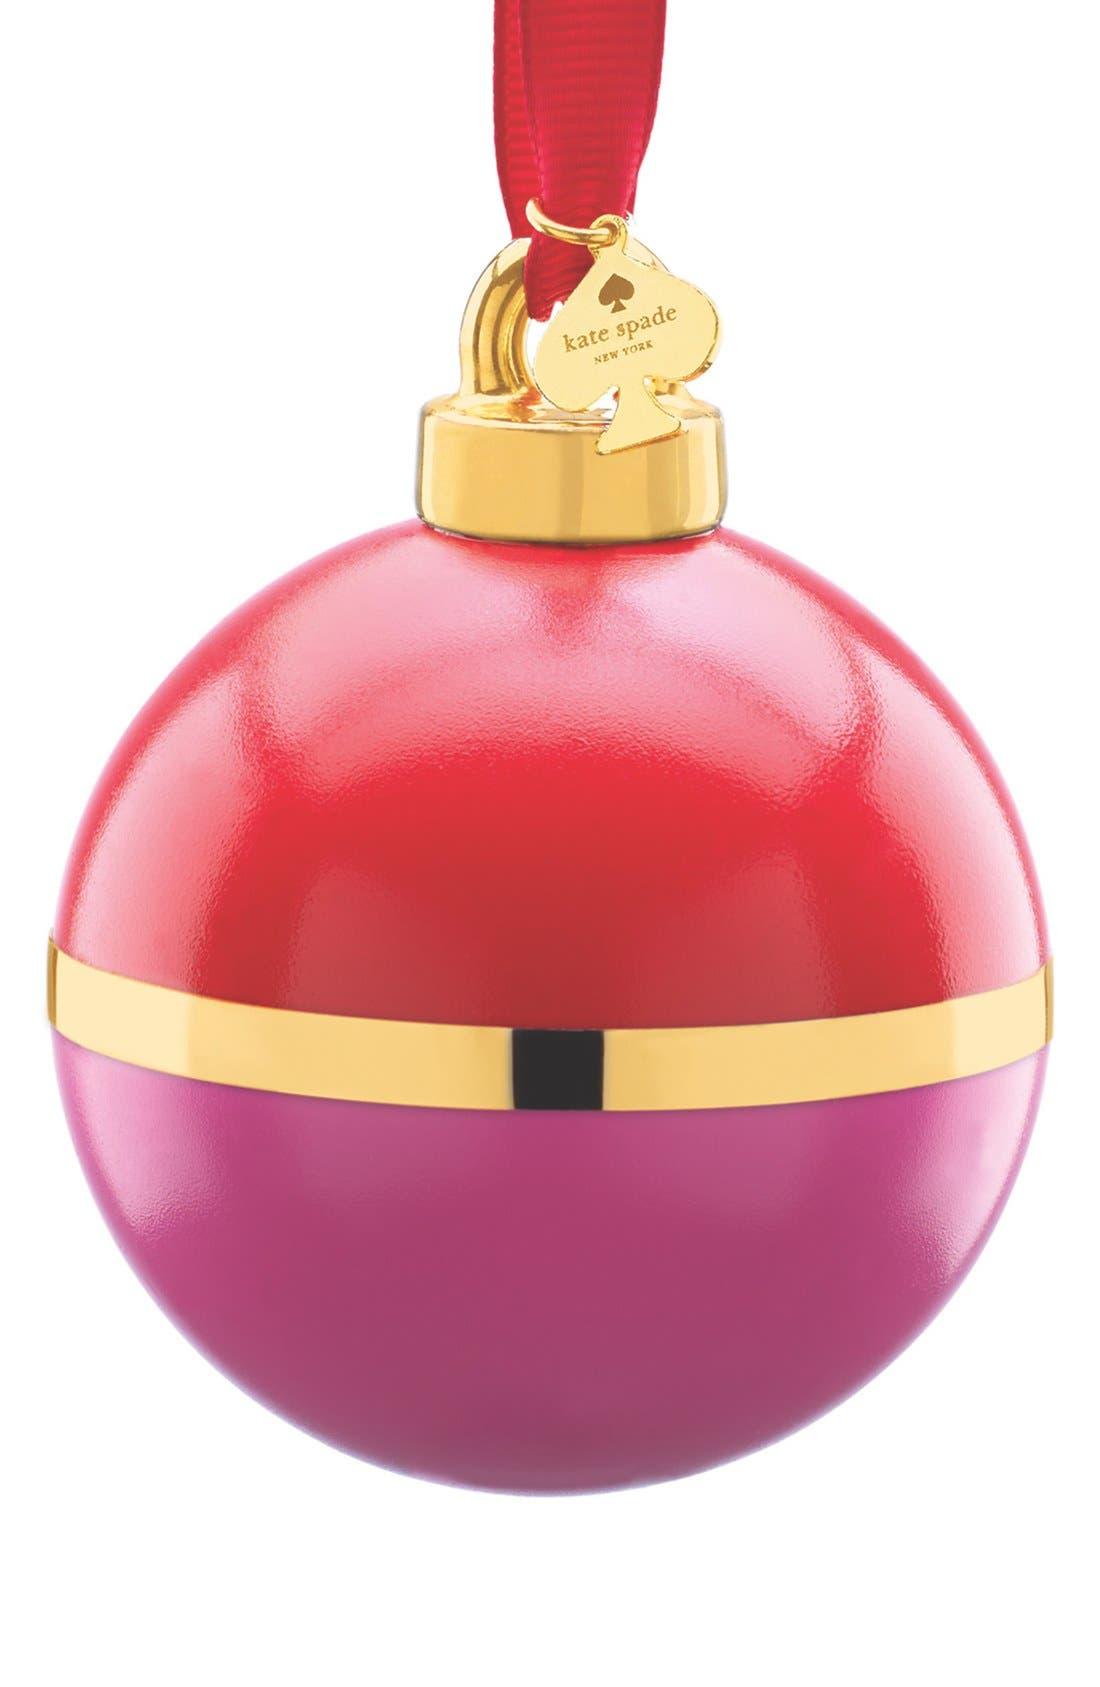 KATE SPADE NEW YORK,                             pink & orange globe ornament,                             Main thumbnail 1, color,                             650